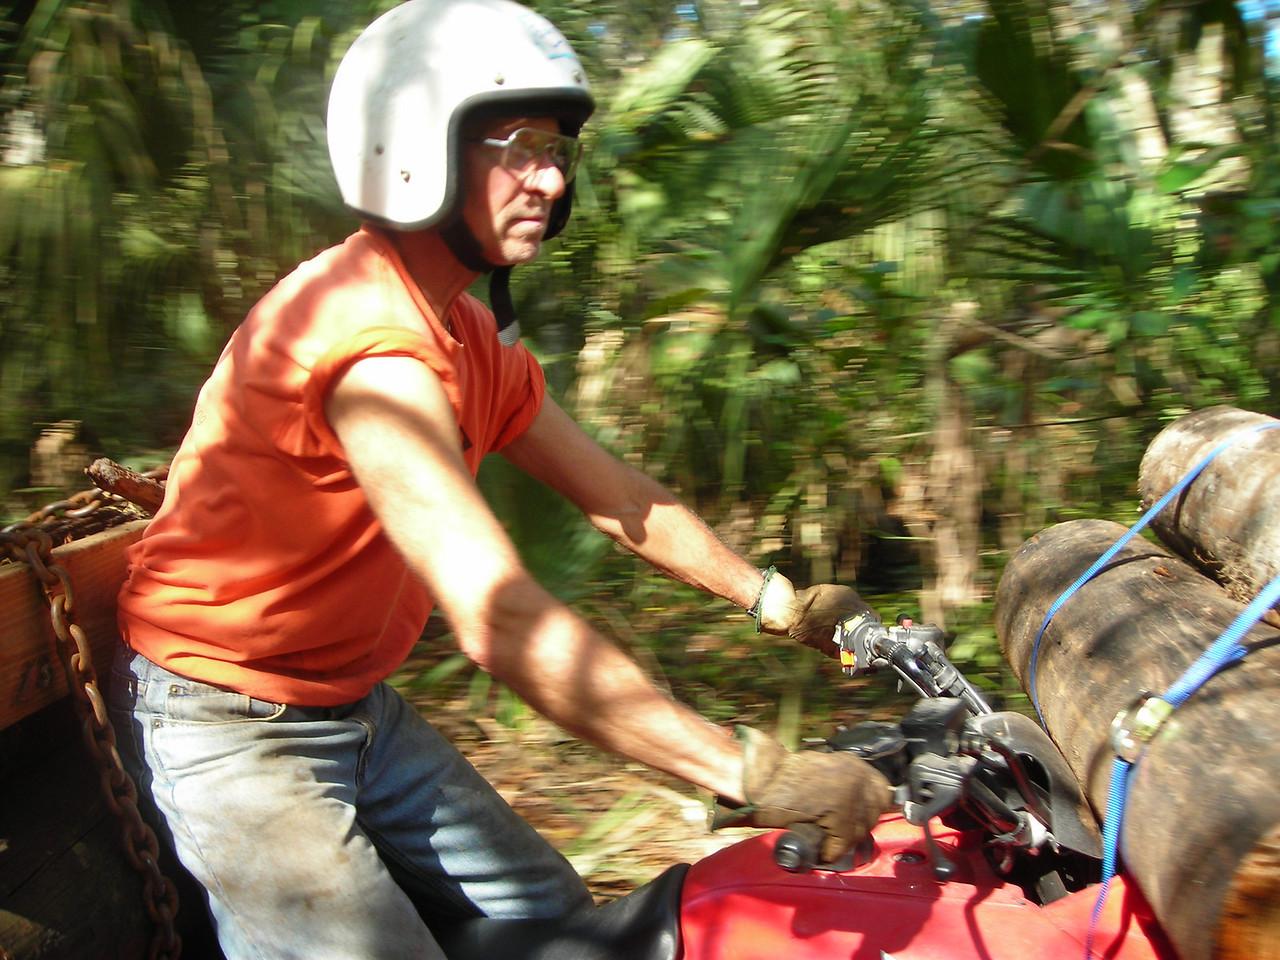 Butch on ATV